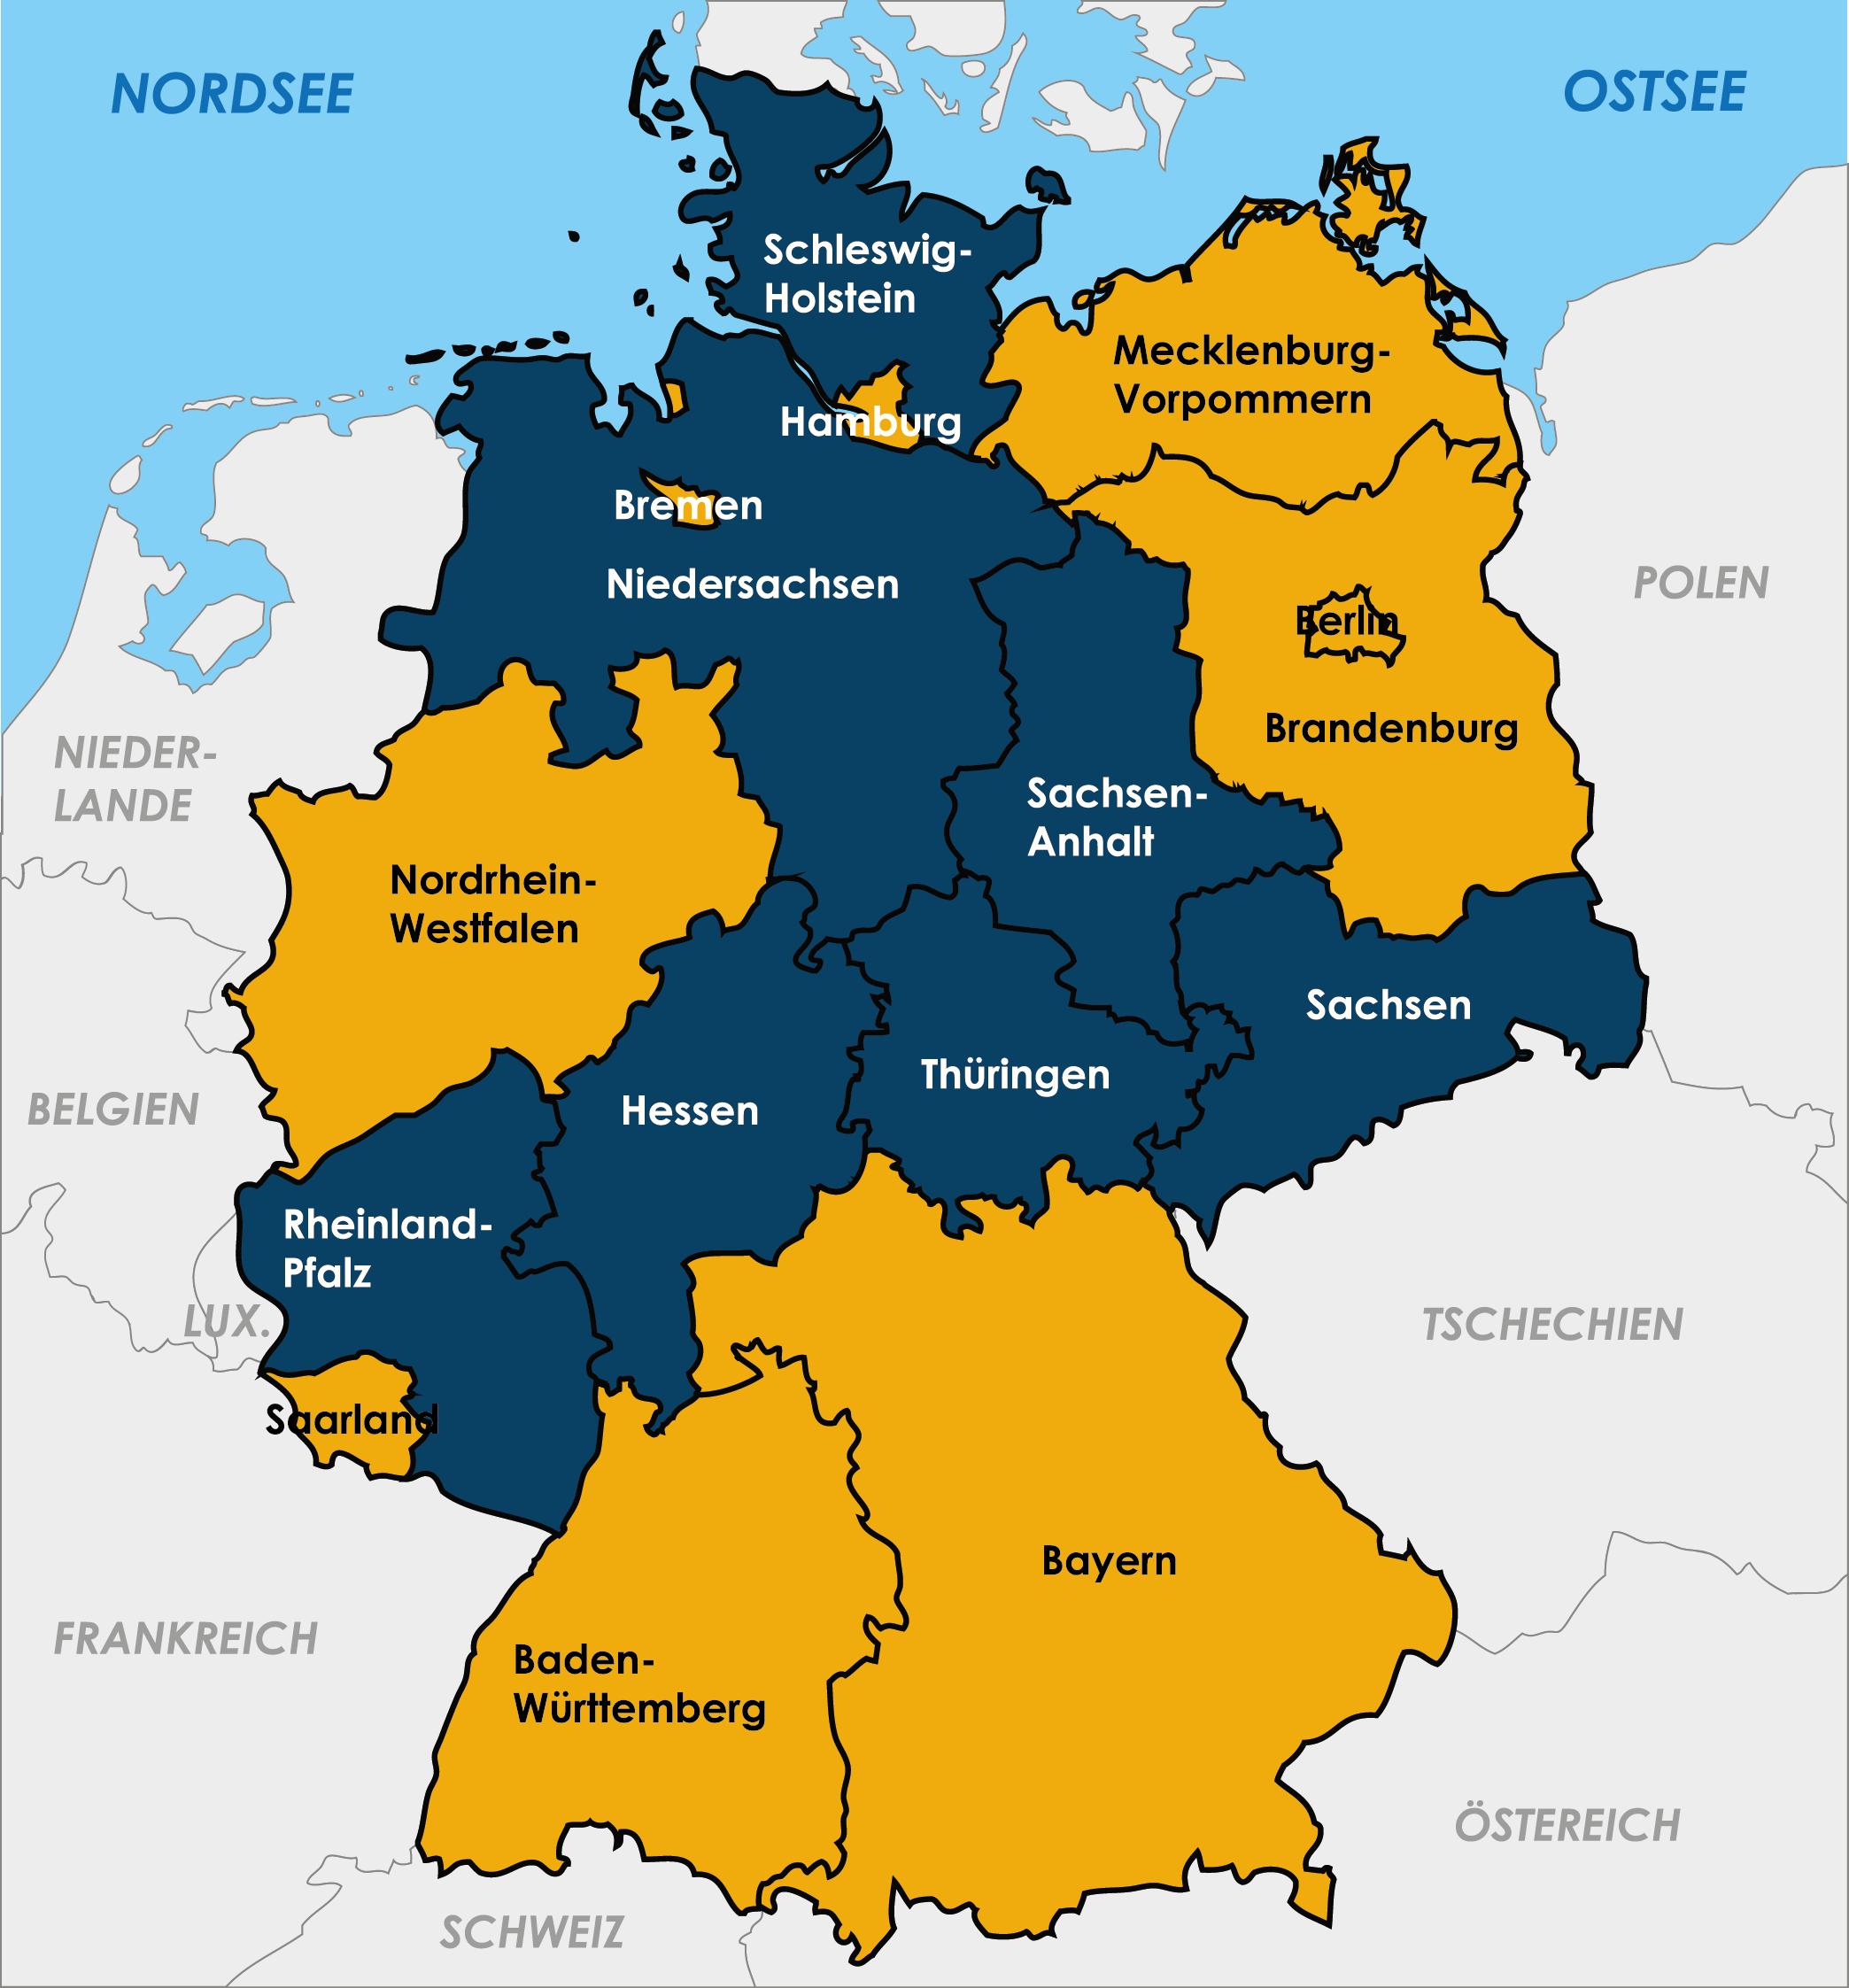 https://www.vergabe24.de/wp-content/uploads/2018/11/deutschland_karte_uvgo.png